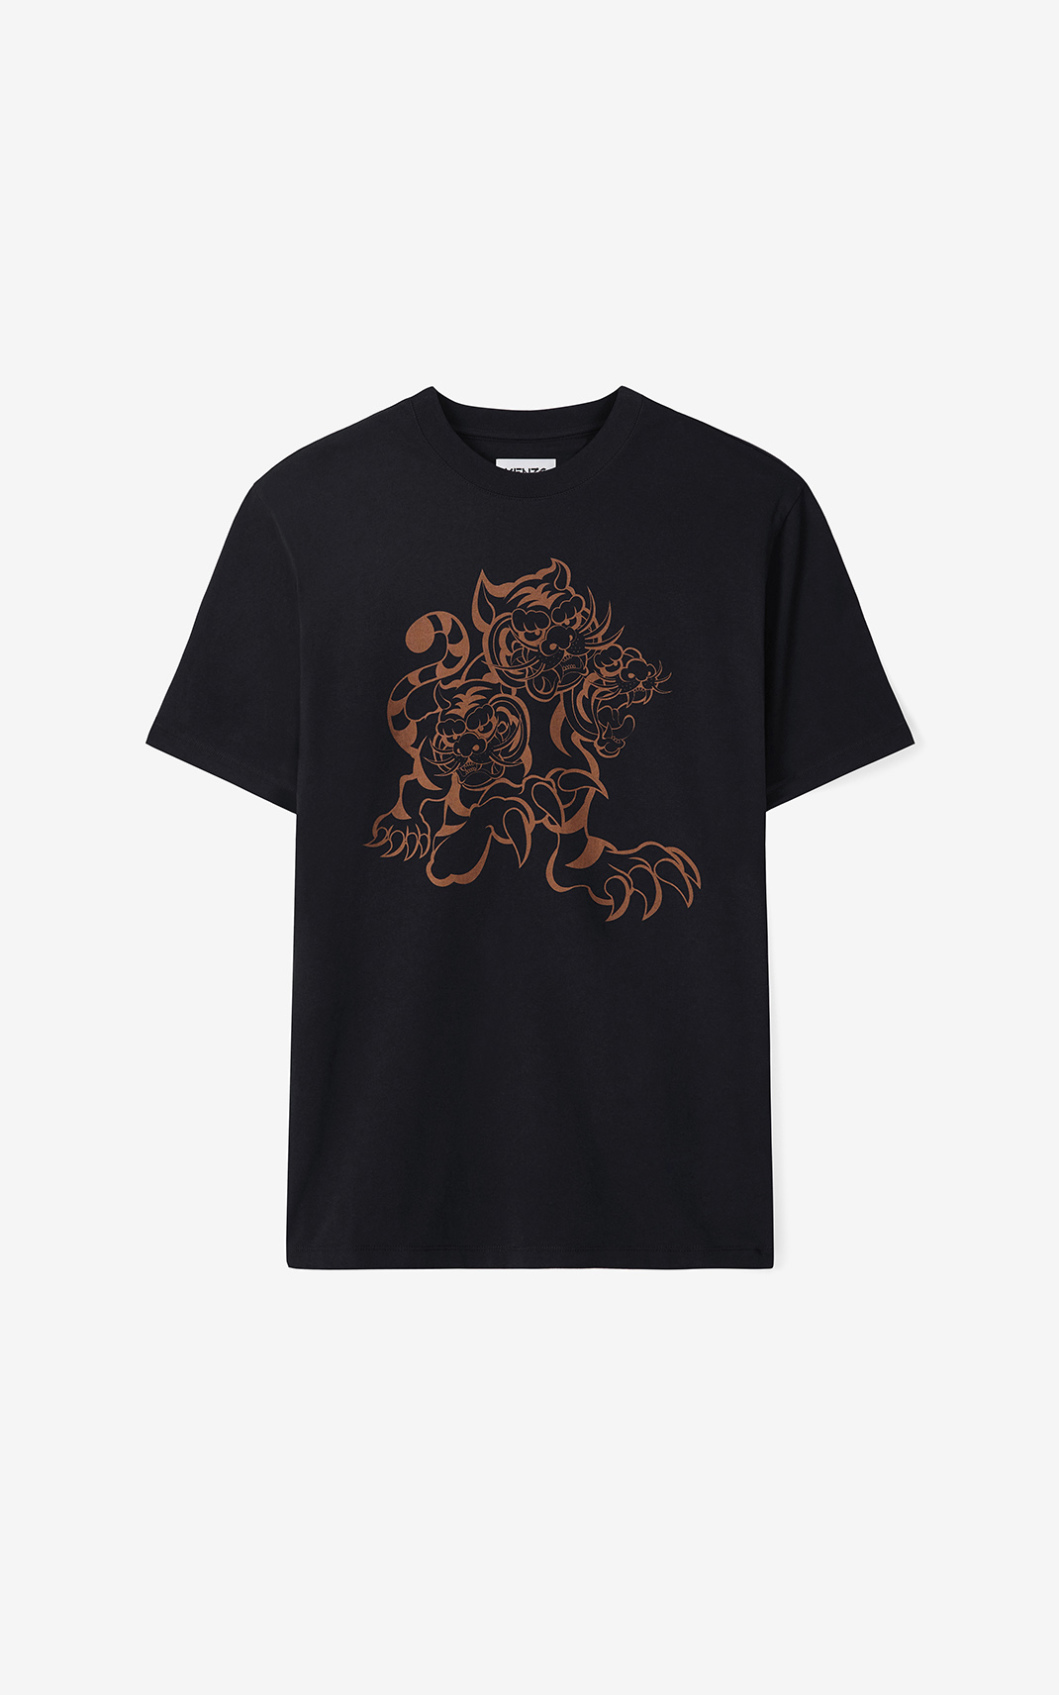 KENZO T-shirt 'Trois Tigres' KENZO x KANSAIYAMAMOTO